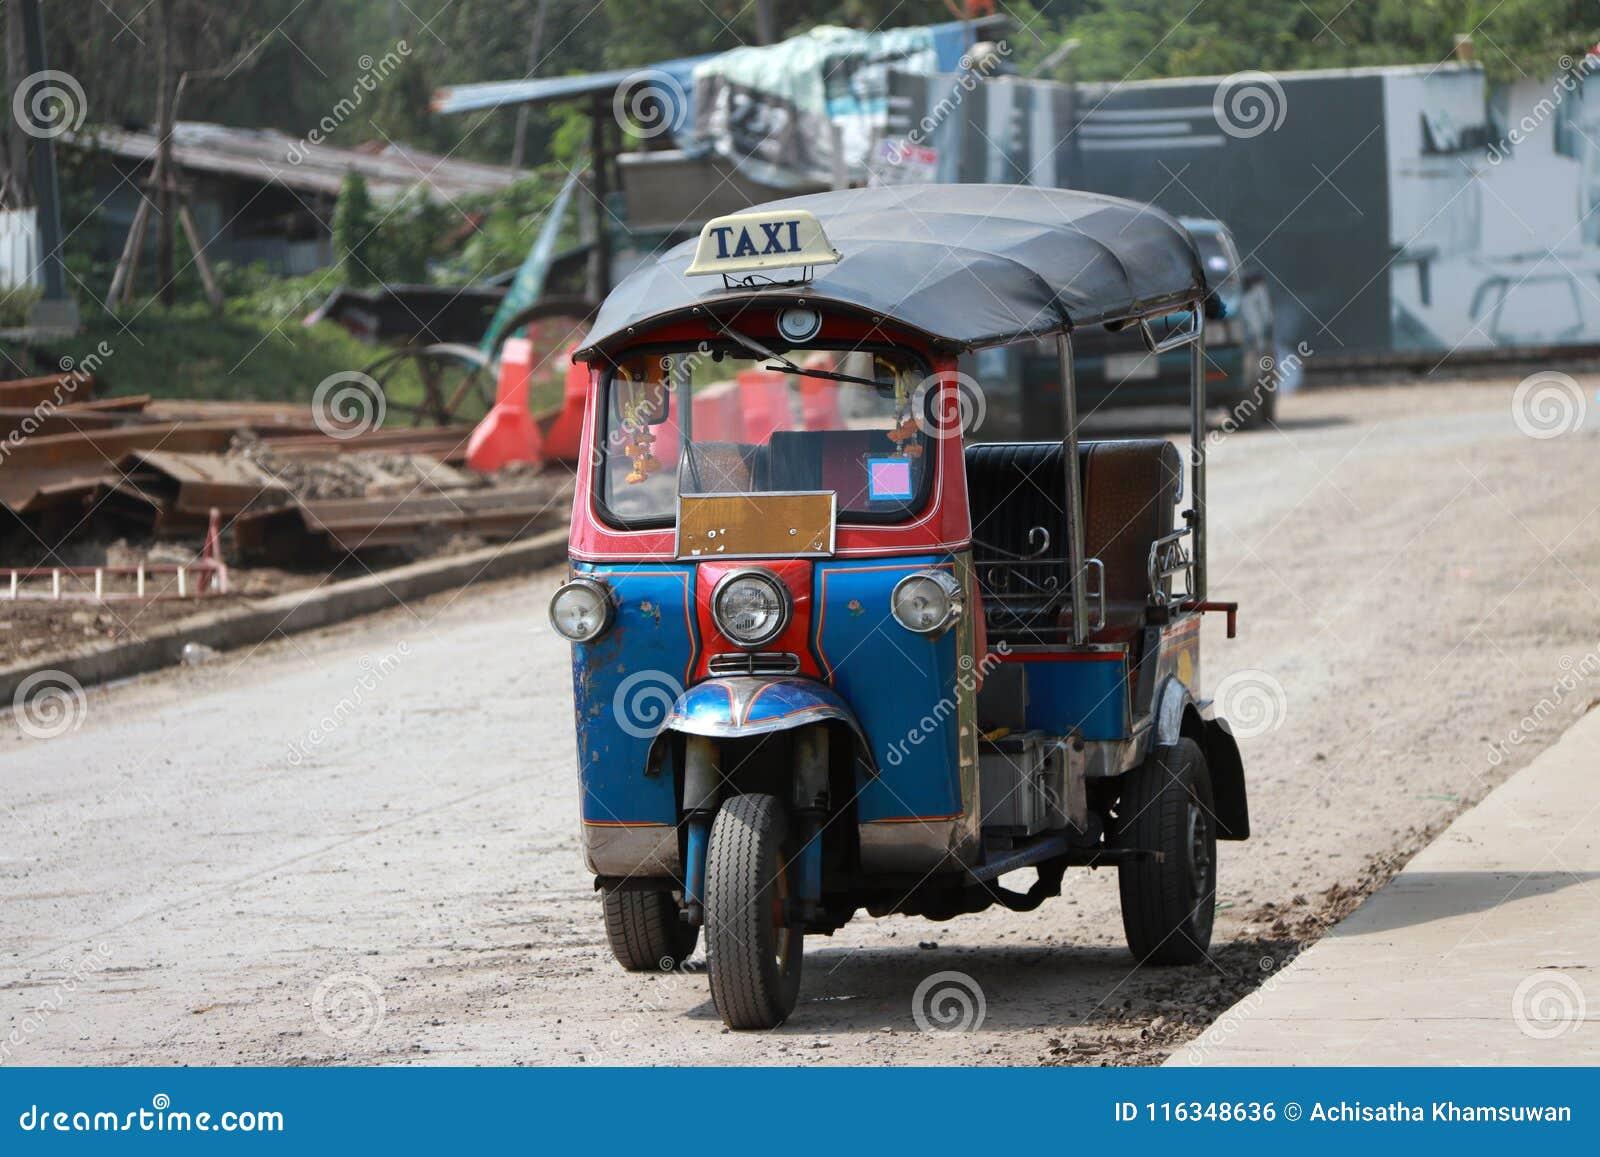 Tuk Tuk is a three-wheeled motorized vehicle used as a taxi